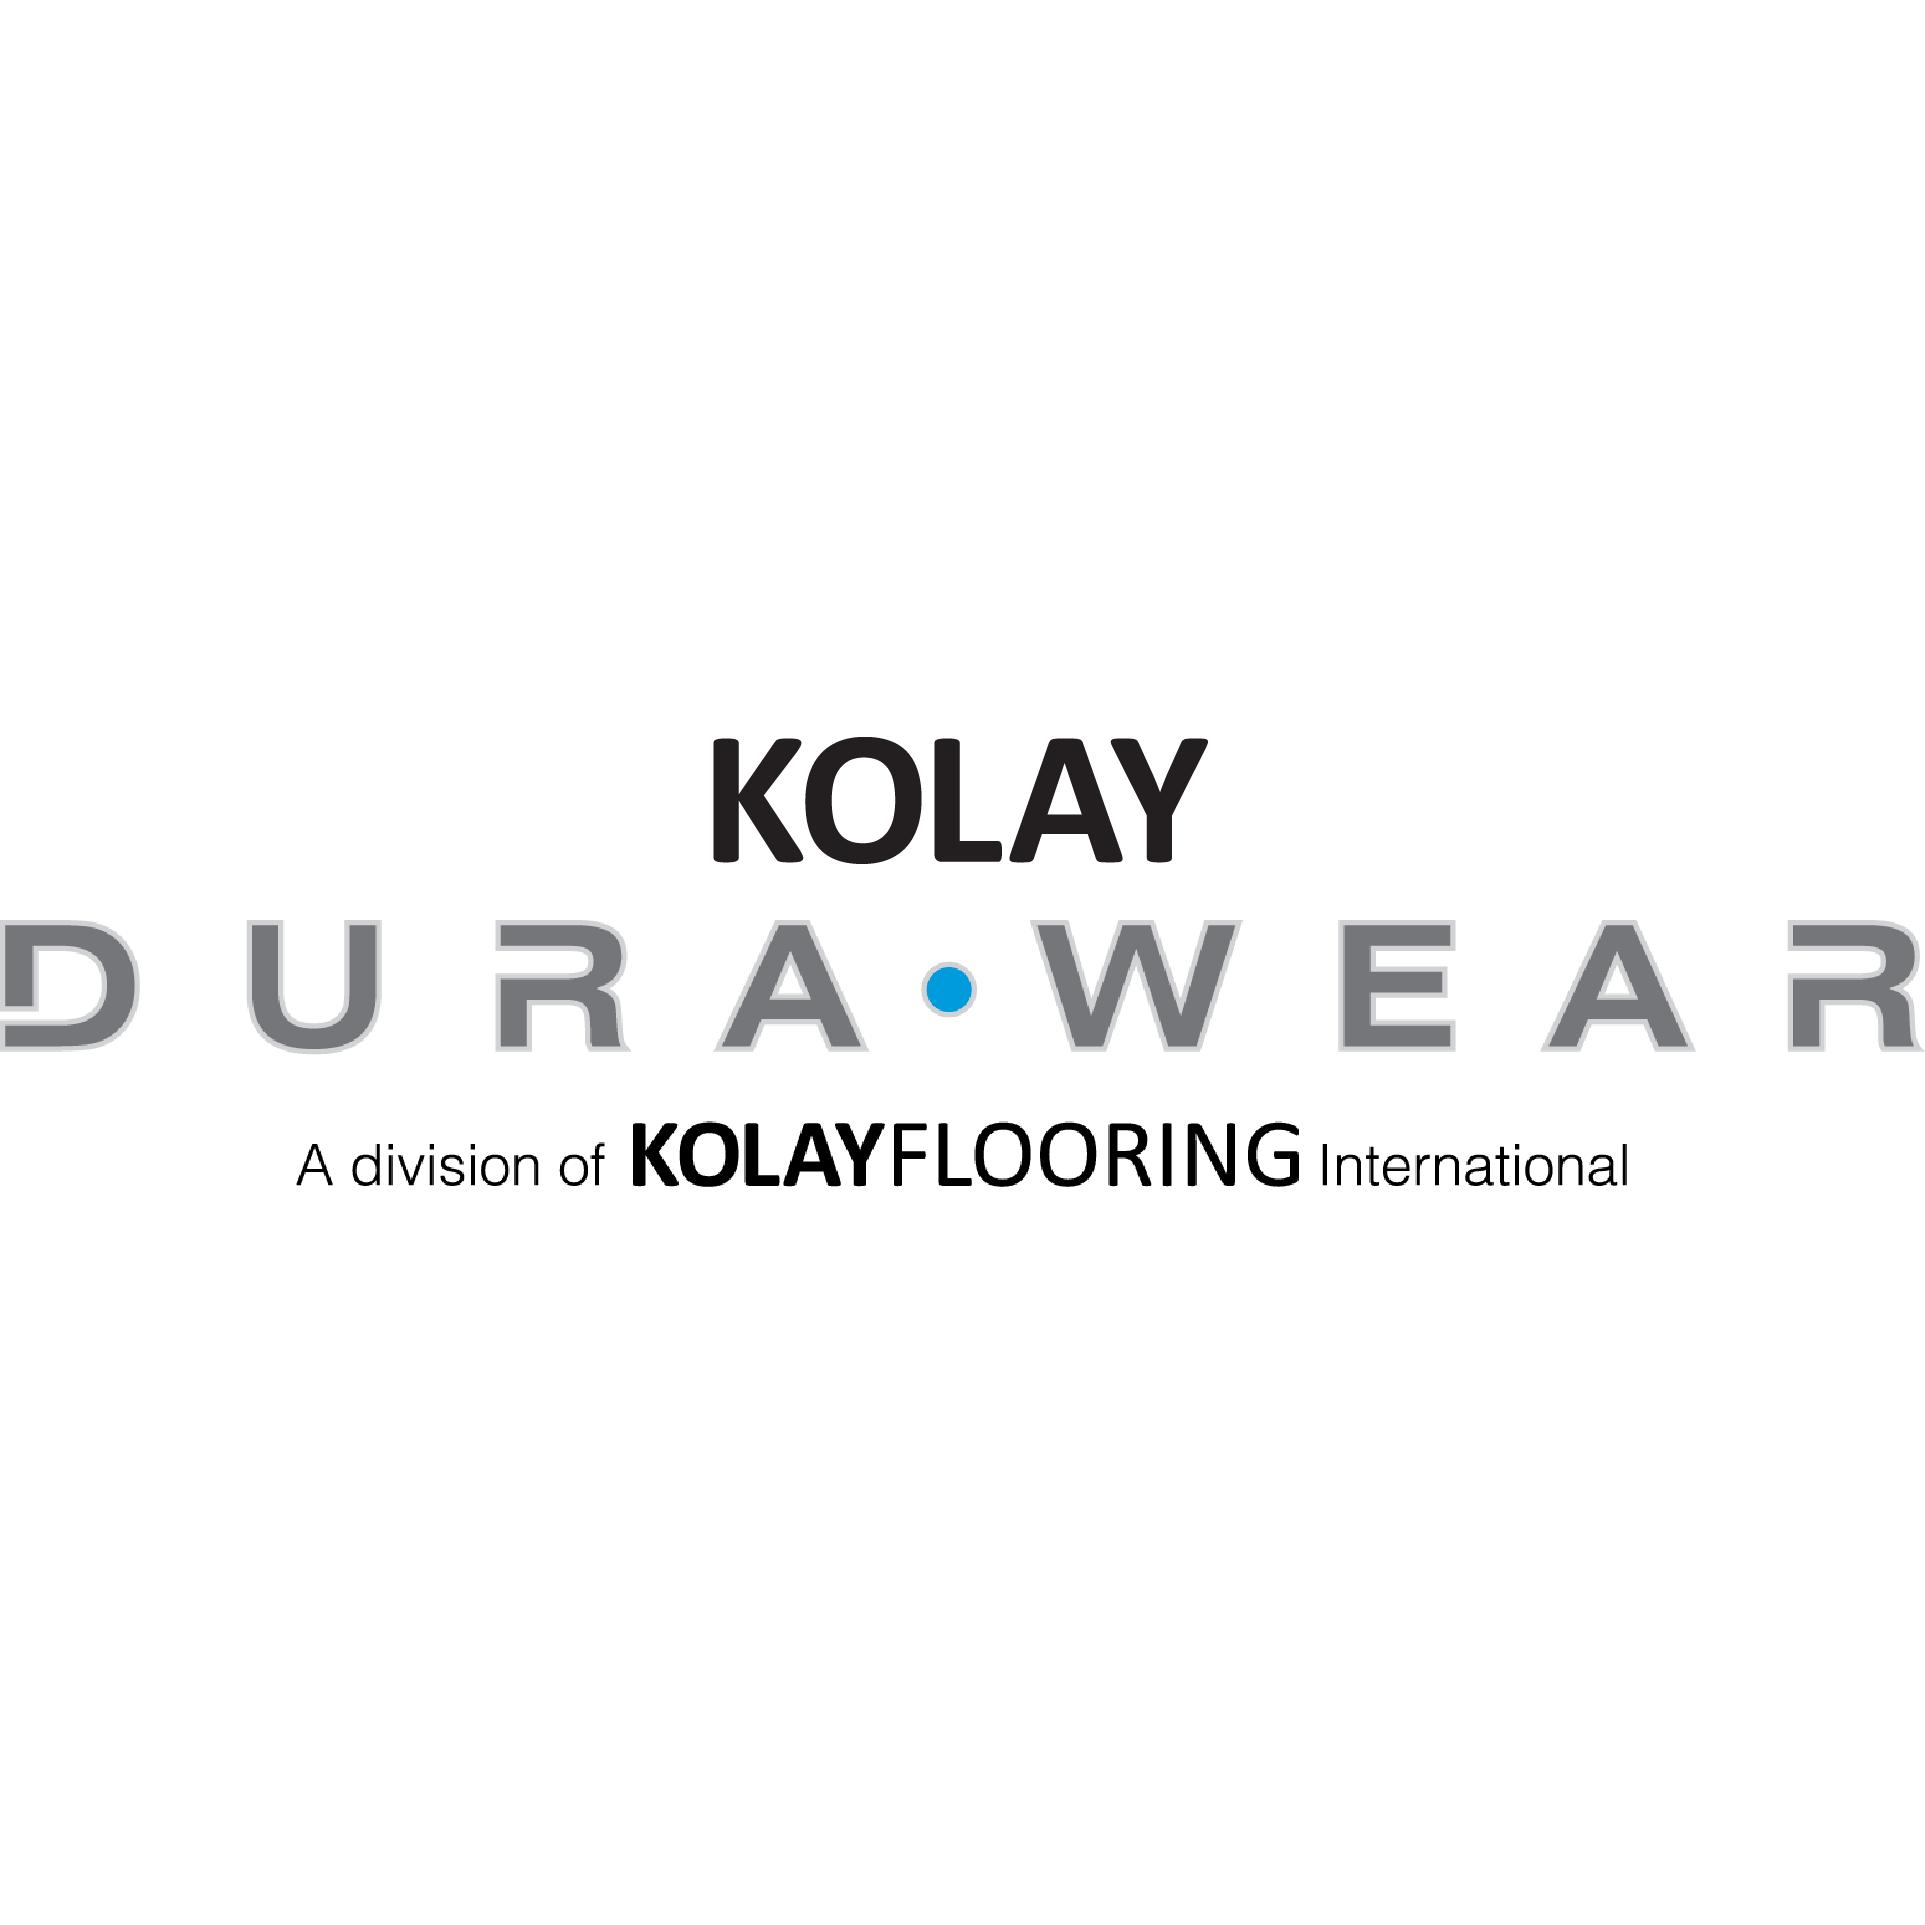 Kolay Flooring International - Walnut, CA 91789 - (909)444-2745 | ShowMeLocal.com